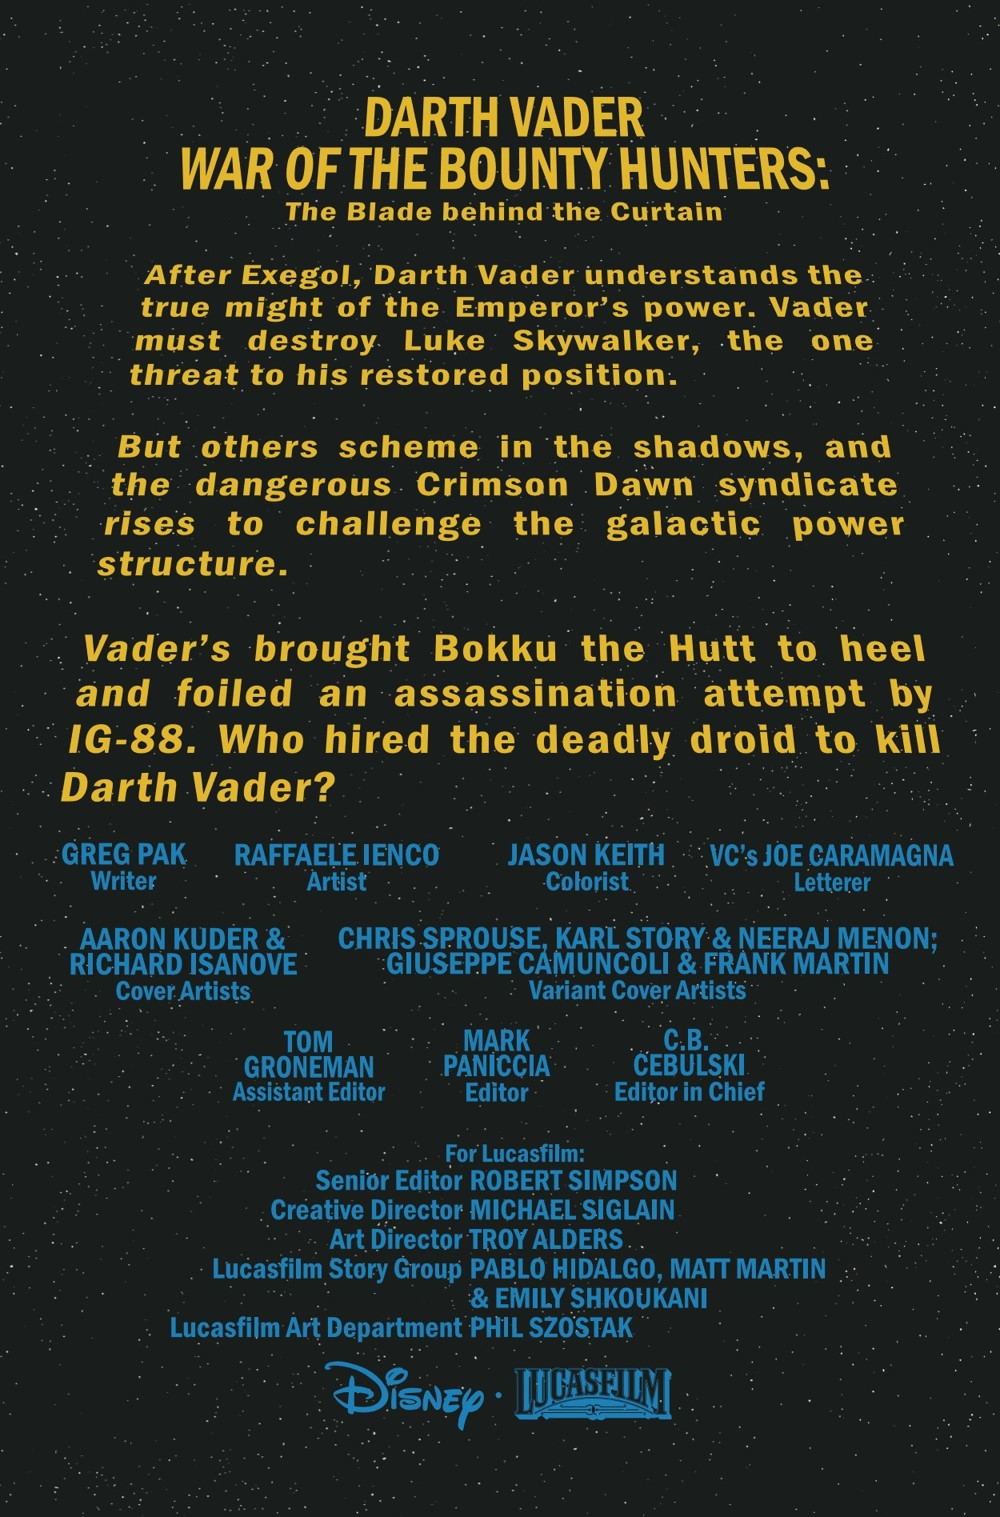 STWVADER2020014_Preview-2 ComicList Previews: STAR WARS DARTH VADER #14